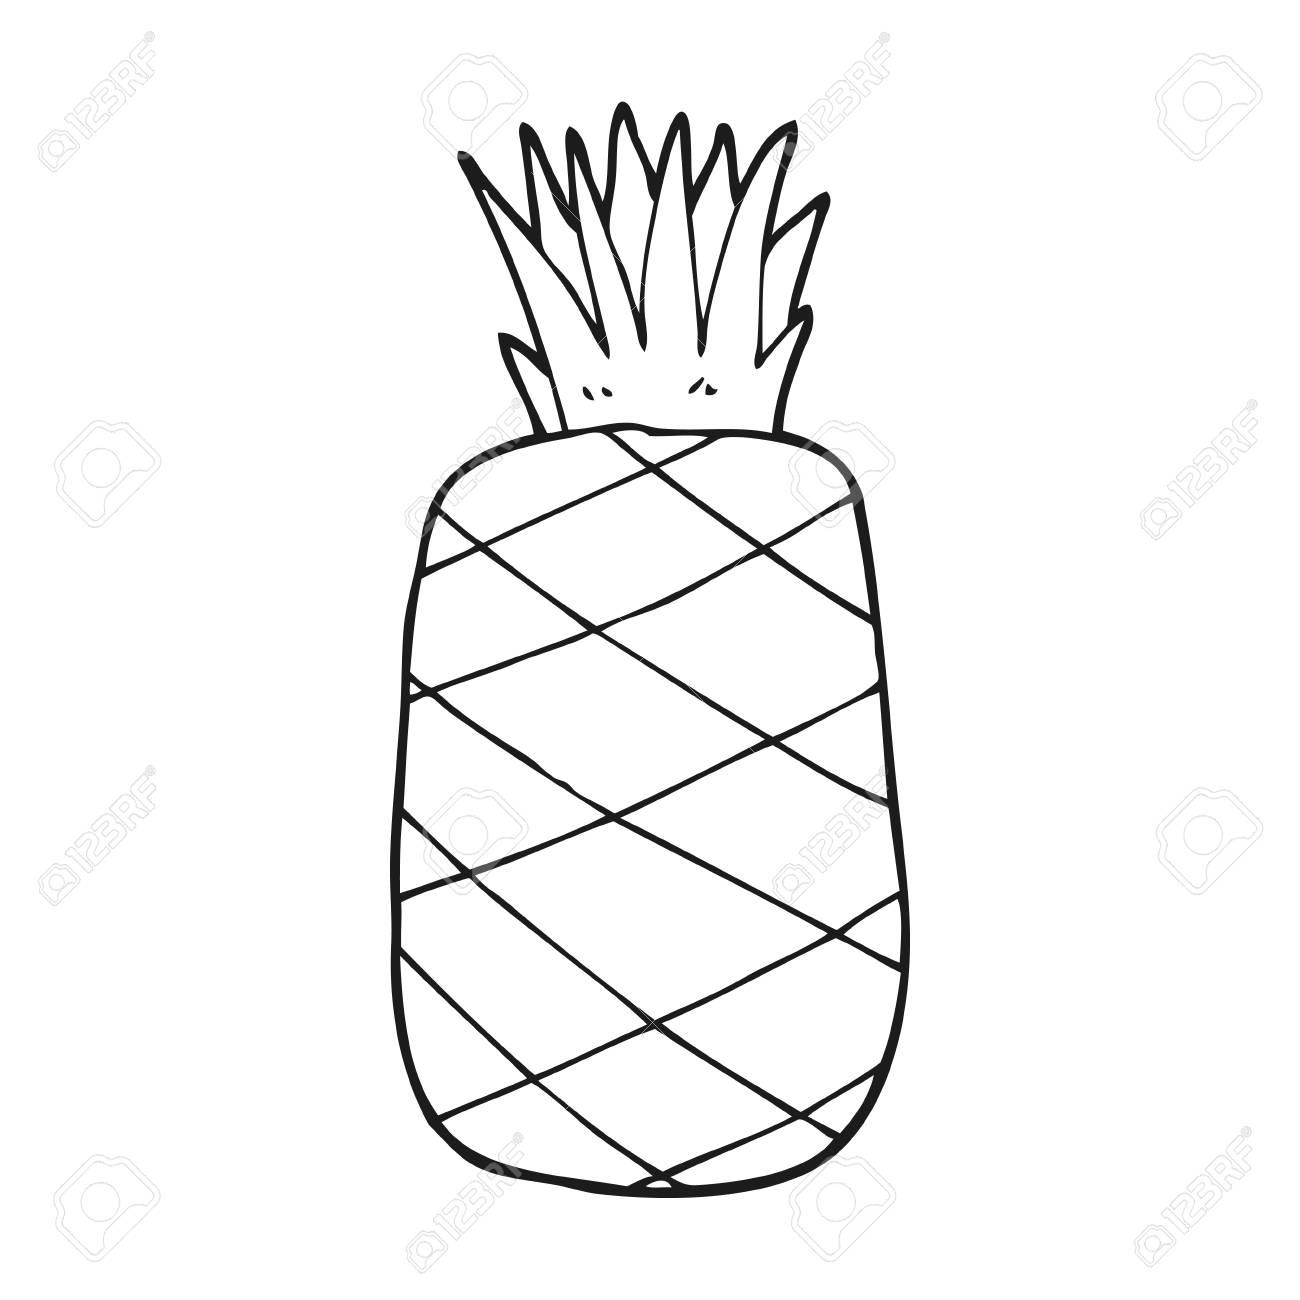 Pineapple Clip Art - Monochrome Photography Transparent PNG